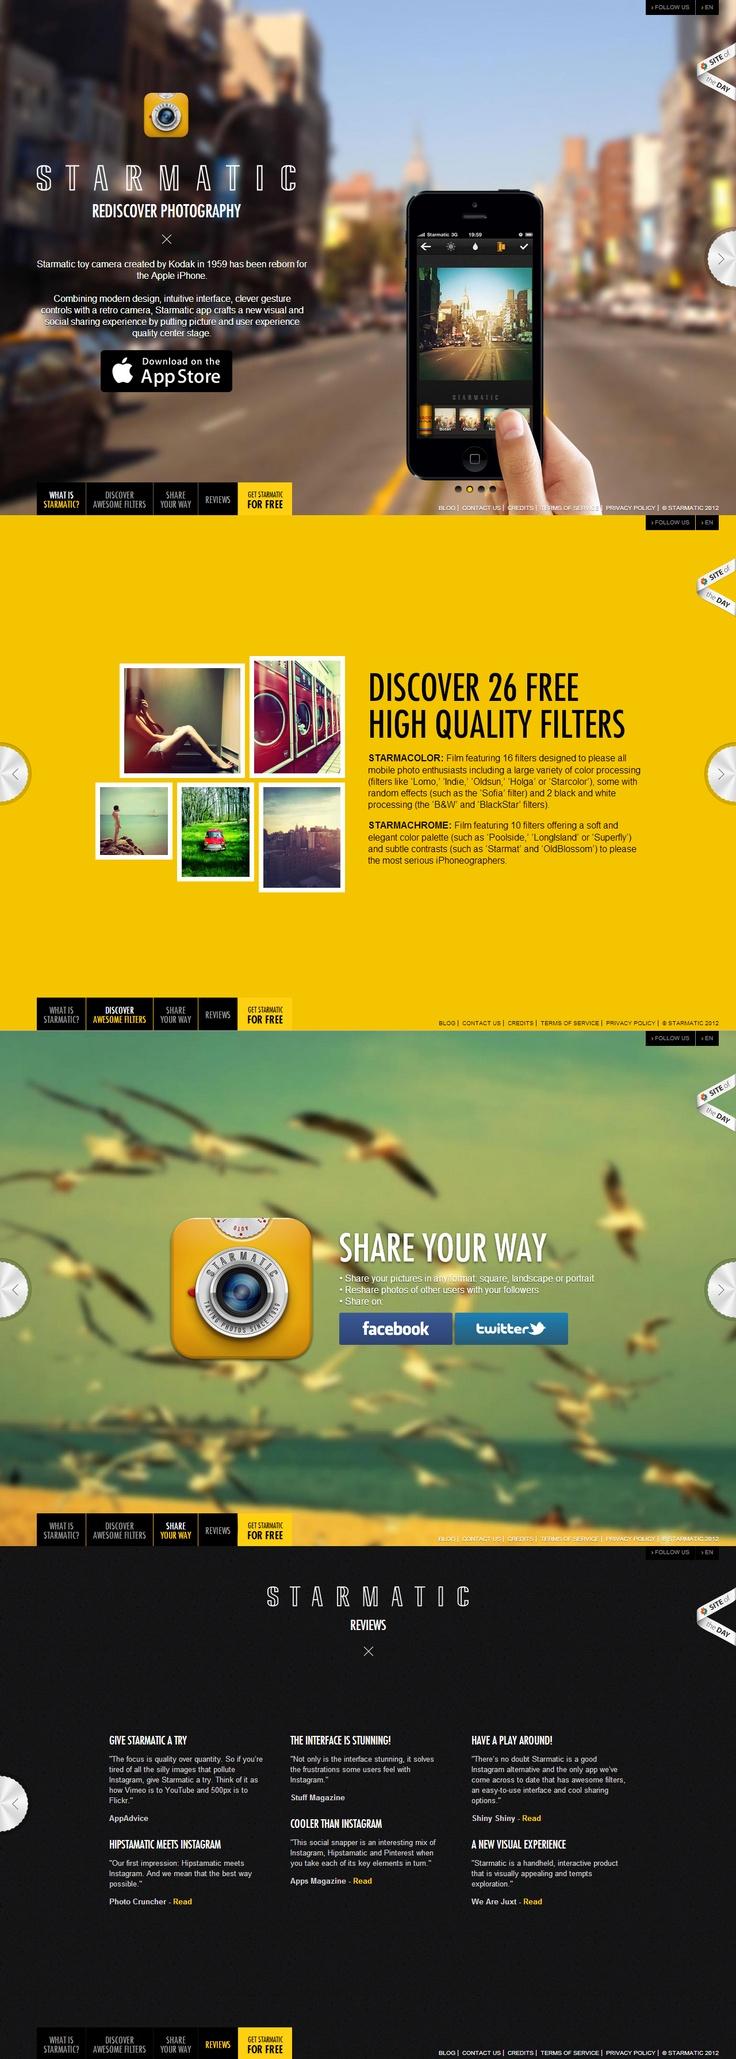 Unique Web Design, Starmatic @designcandy #WebDesign #Design (http://www.pinterest.com/aldenchong/)